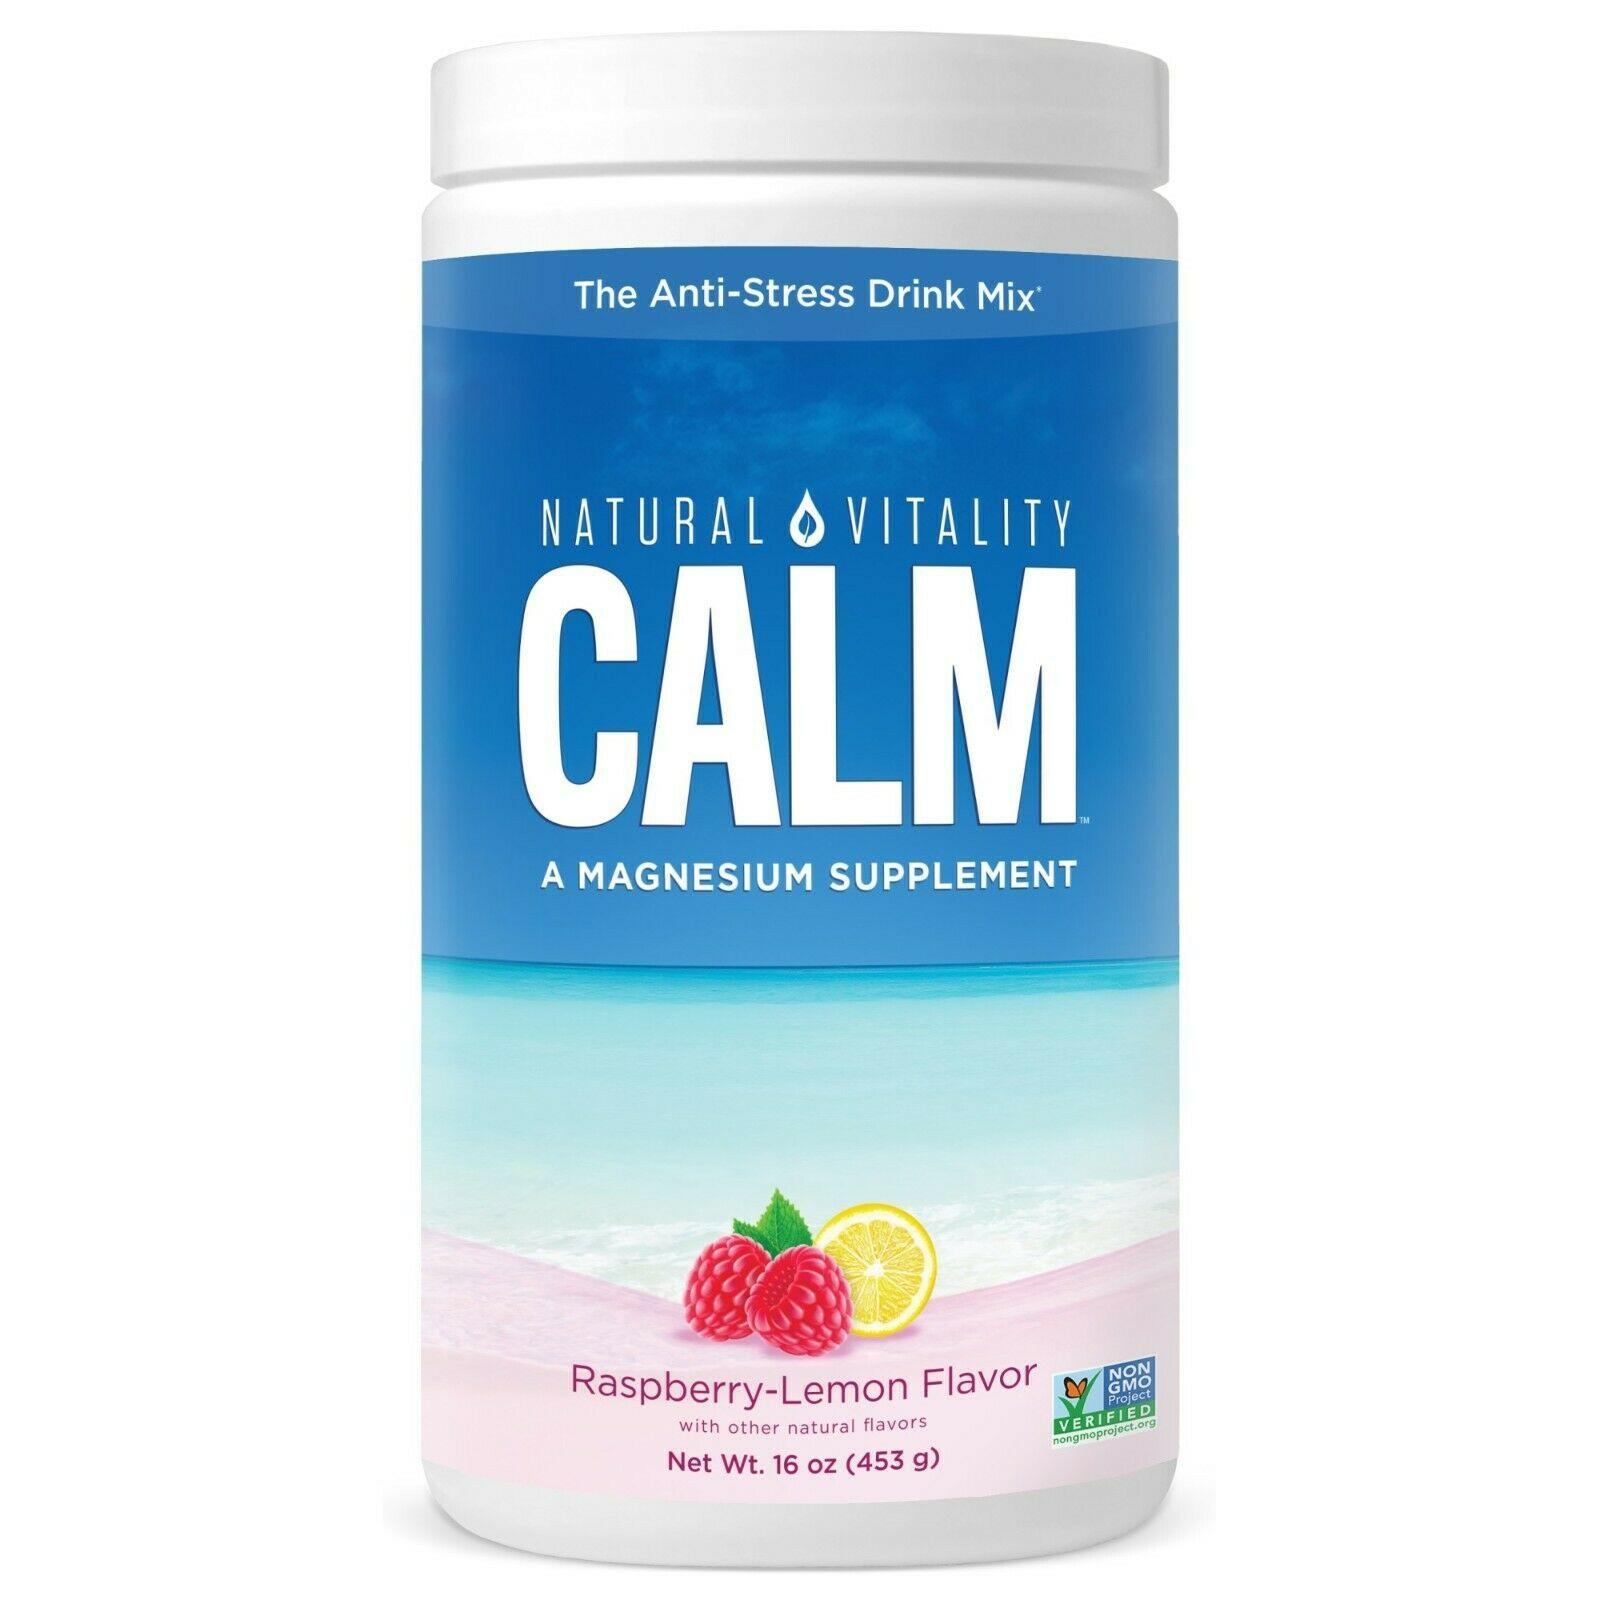 Natural Vitality Calm Anti-Stress Drink Mix, Magnesium, Raspberry Lemon, 16 Oz.. - $39.59